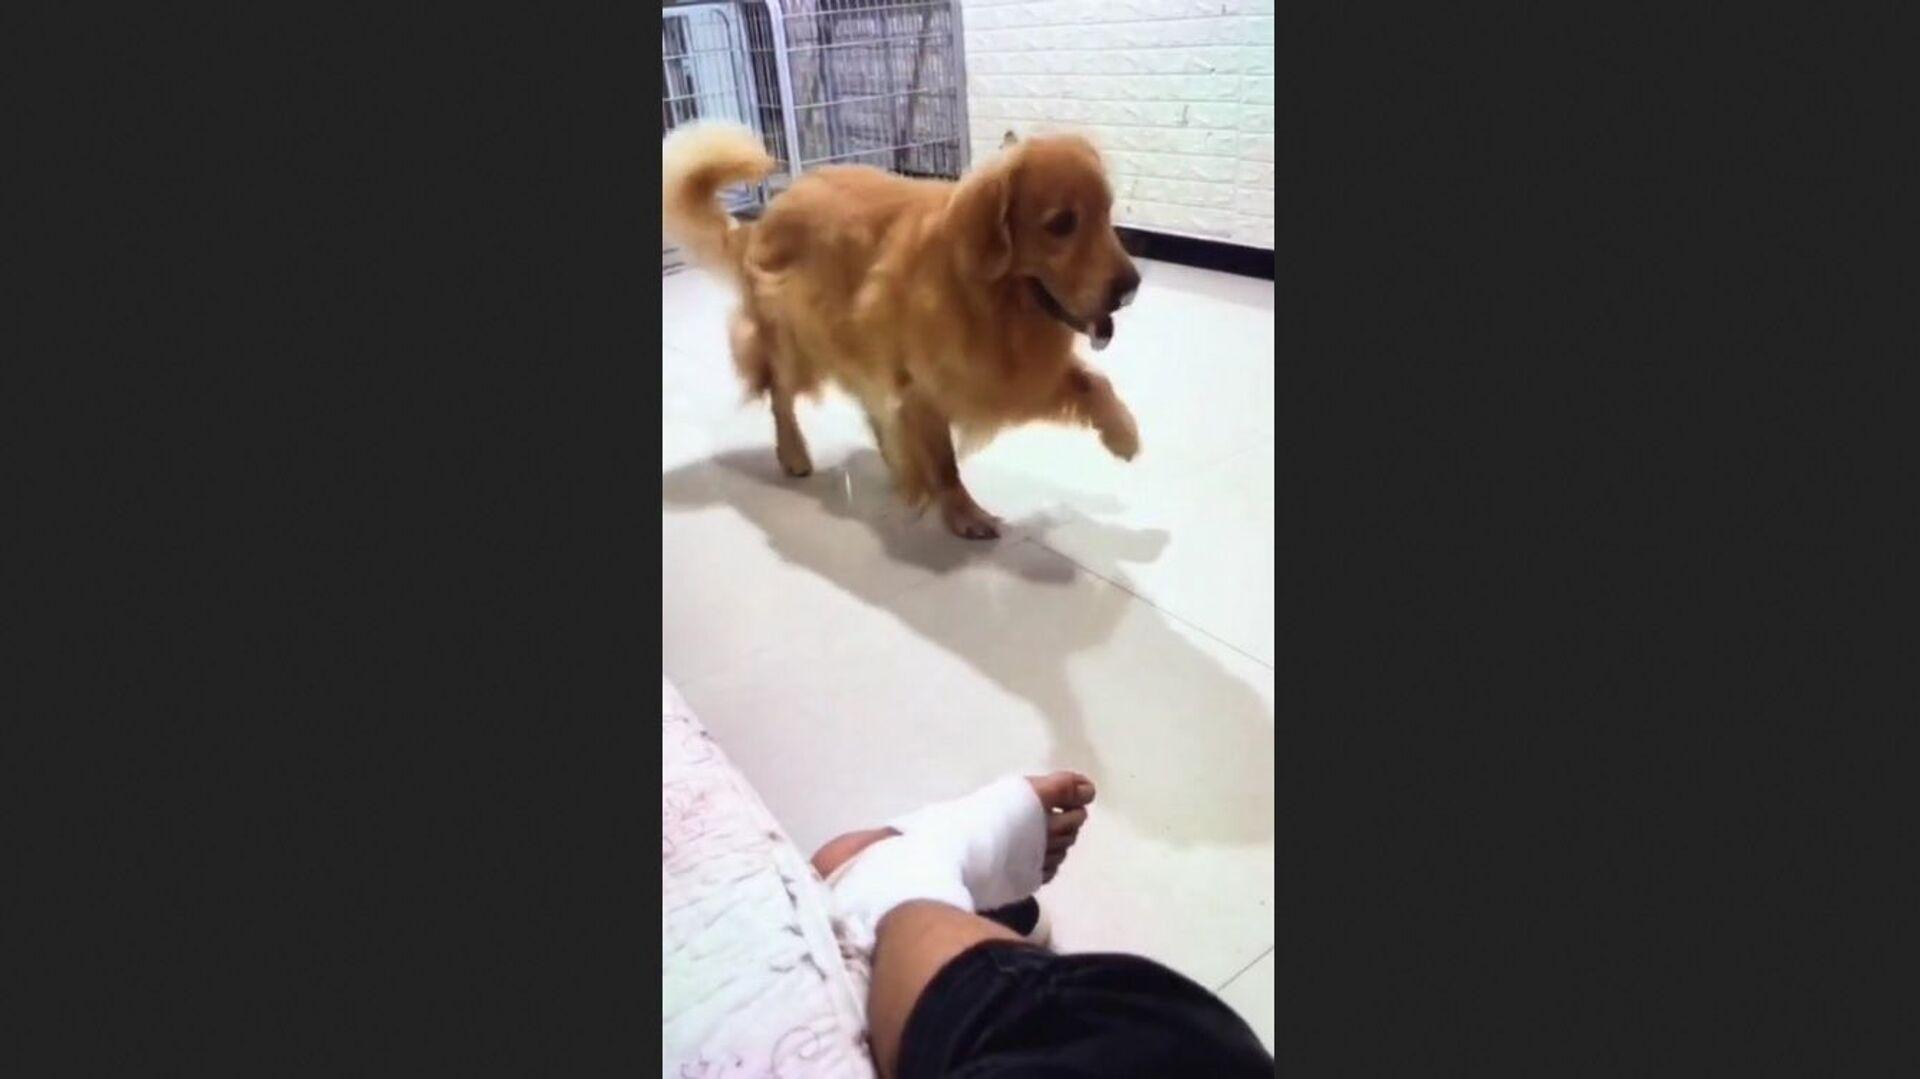 Puppies | Cuteness | Dogs - Sputnik International, 1920, 07.09.2021